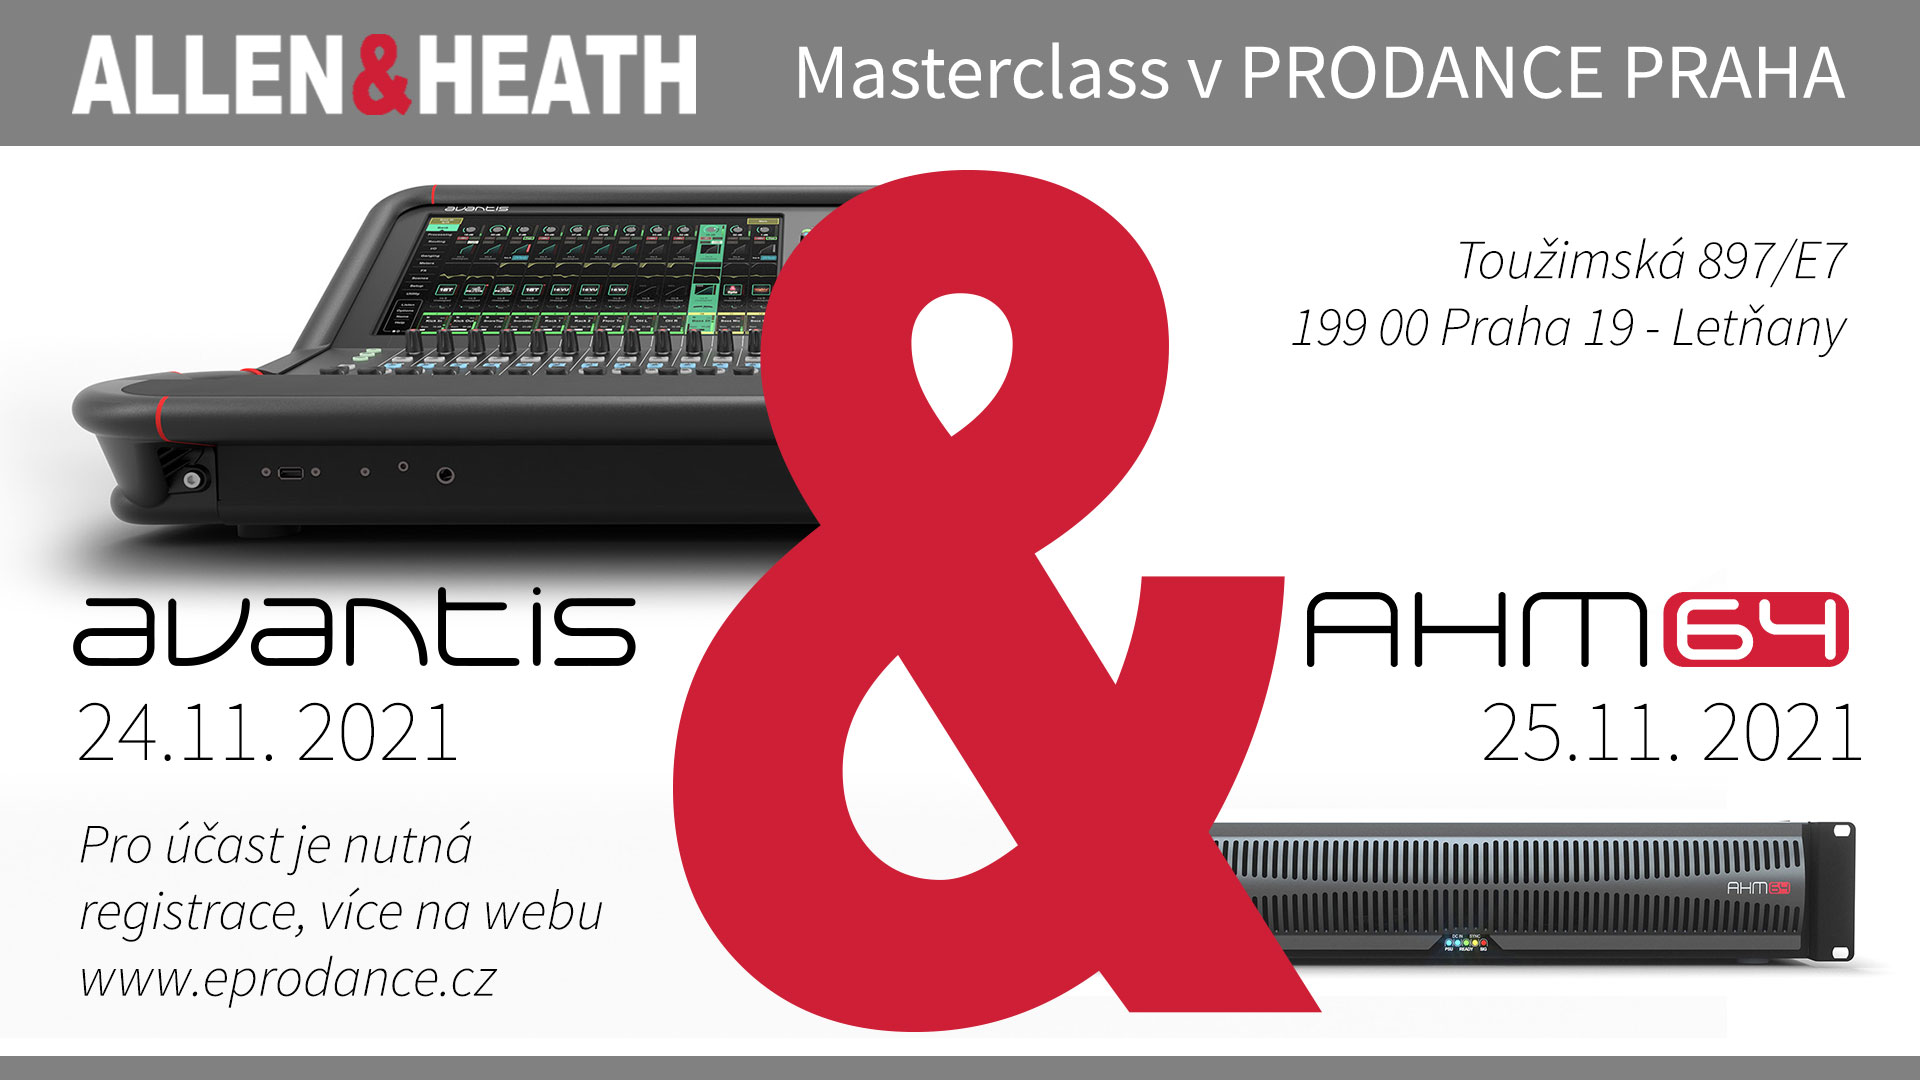 Allen & Heath Masterclass v PRODANCE